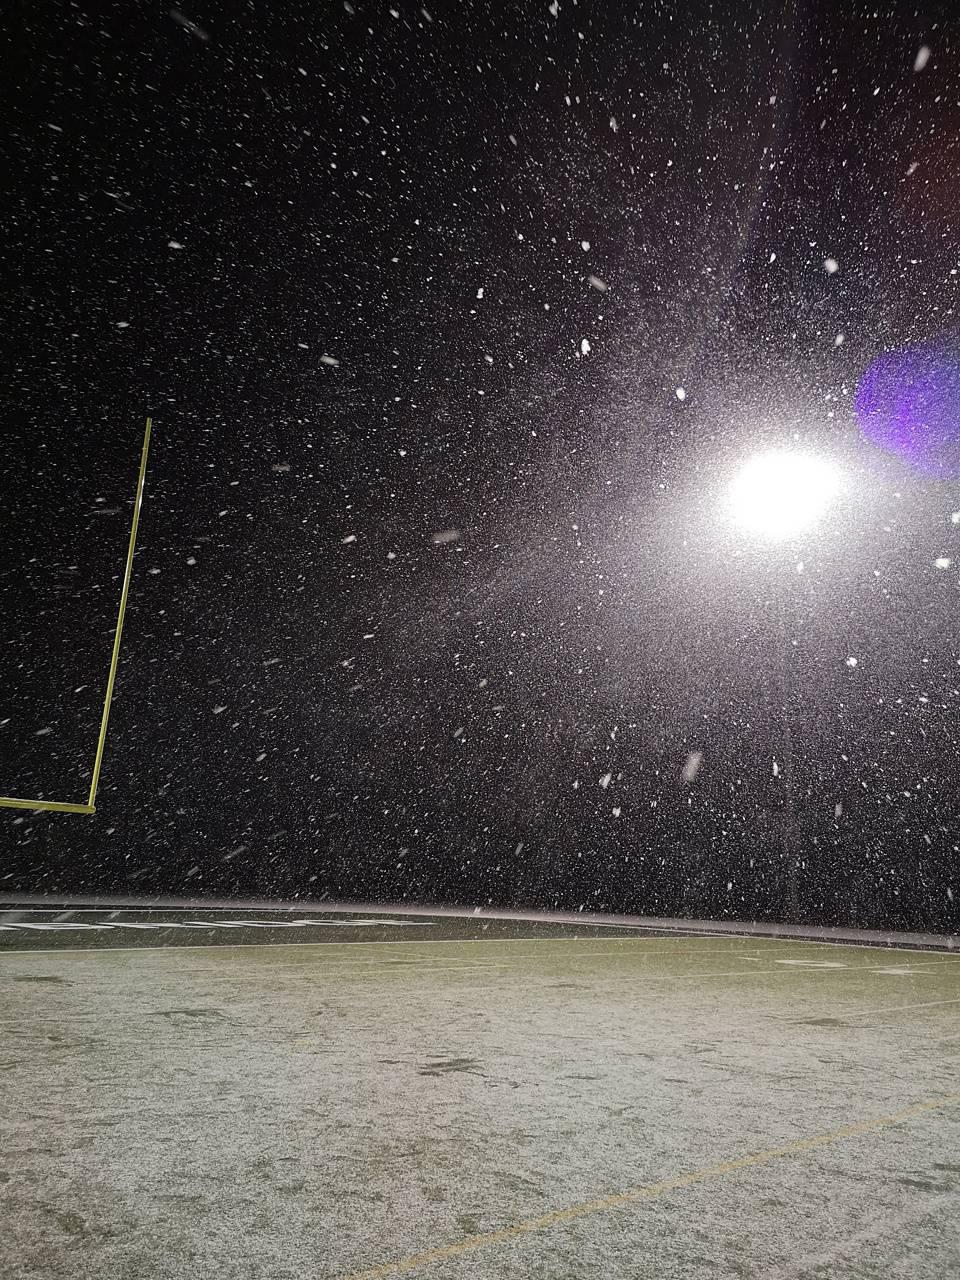 Snowy Stadium